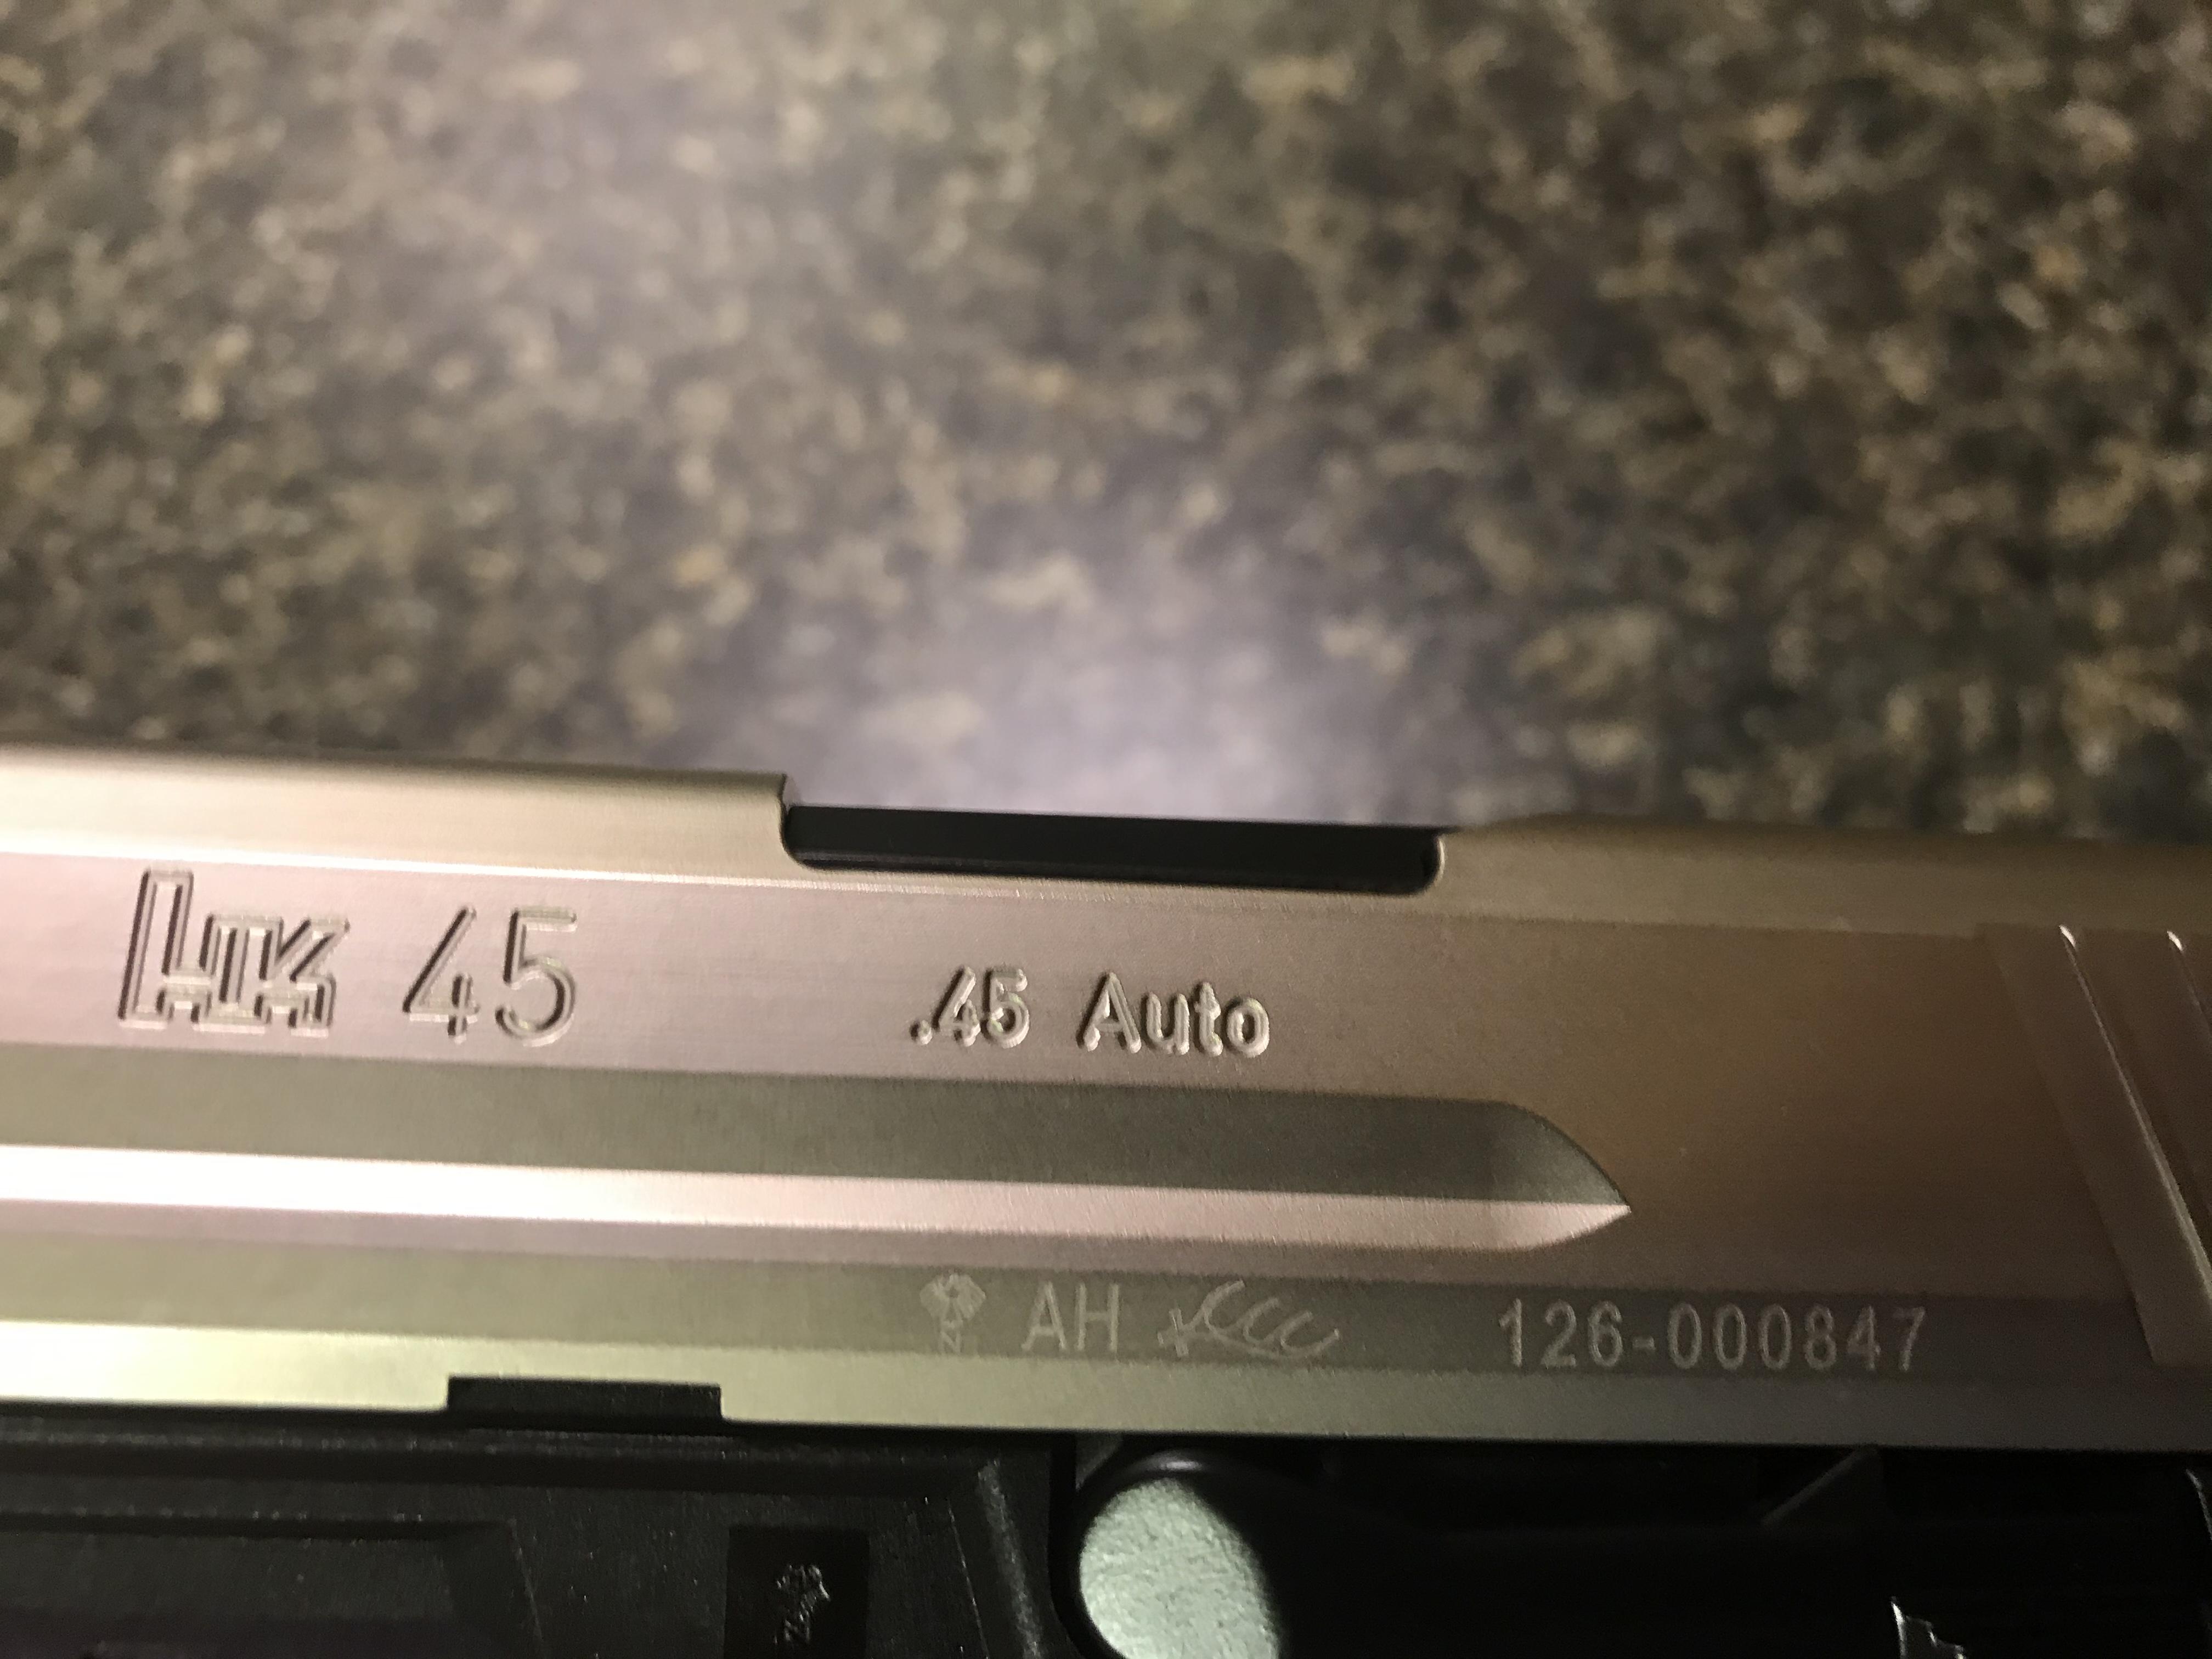 WTS:  HK45, German-made, custom finish, LEM with manual safety and night sights-f949dc2a-bb73-490a-b6d6-aabdc6ad7b38.jpeg